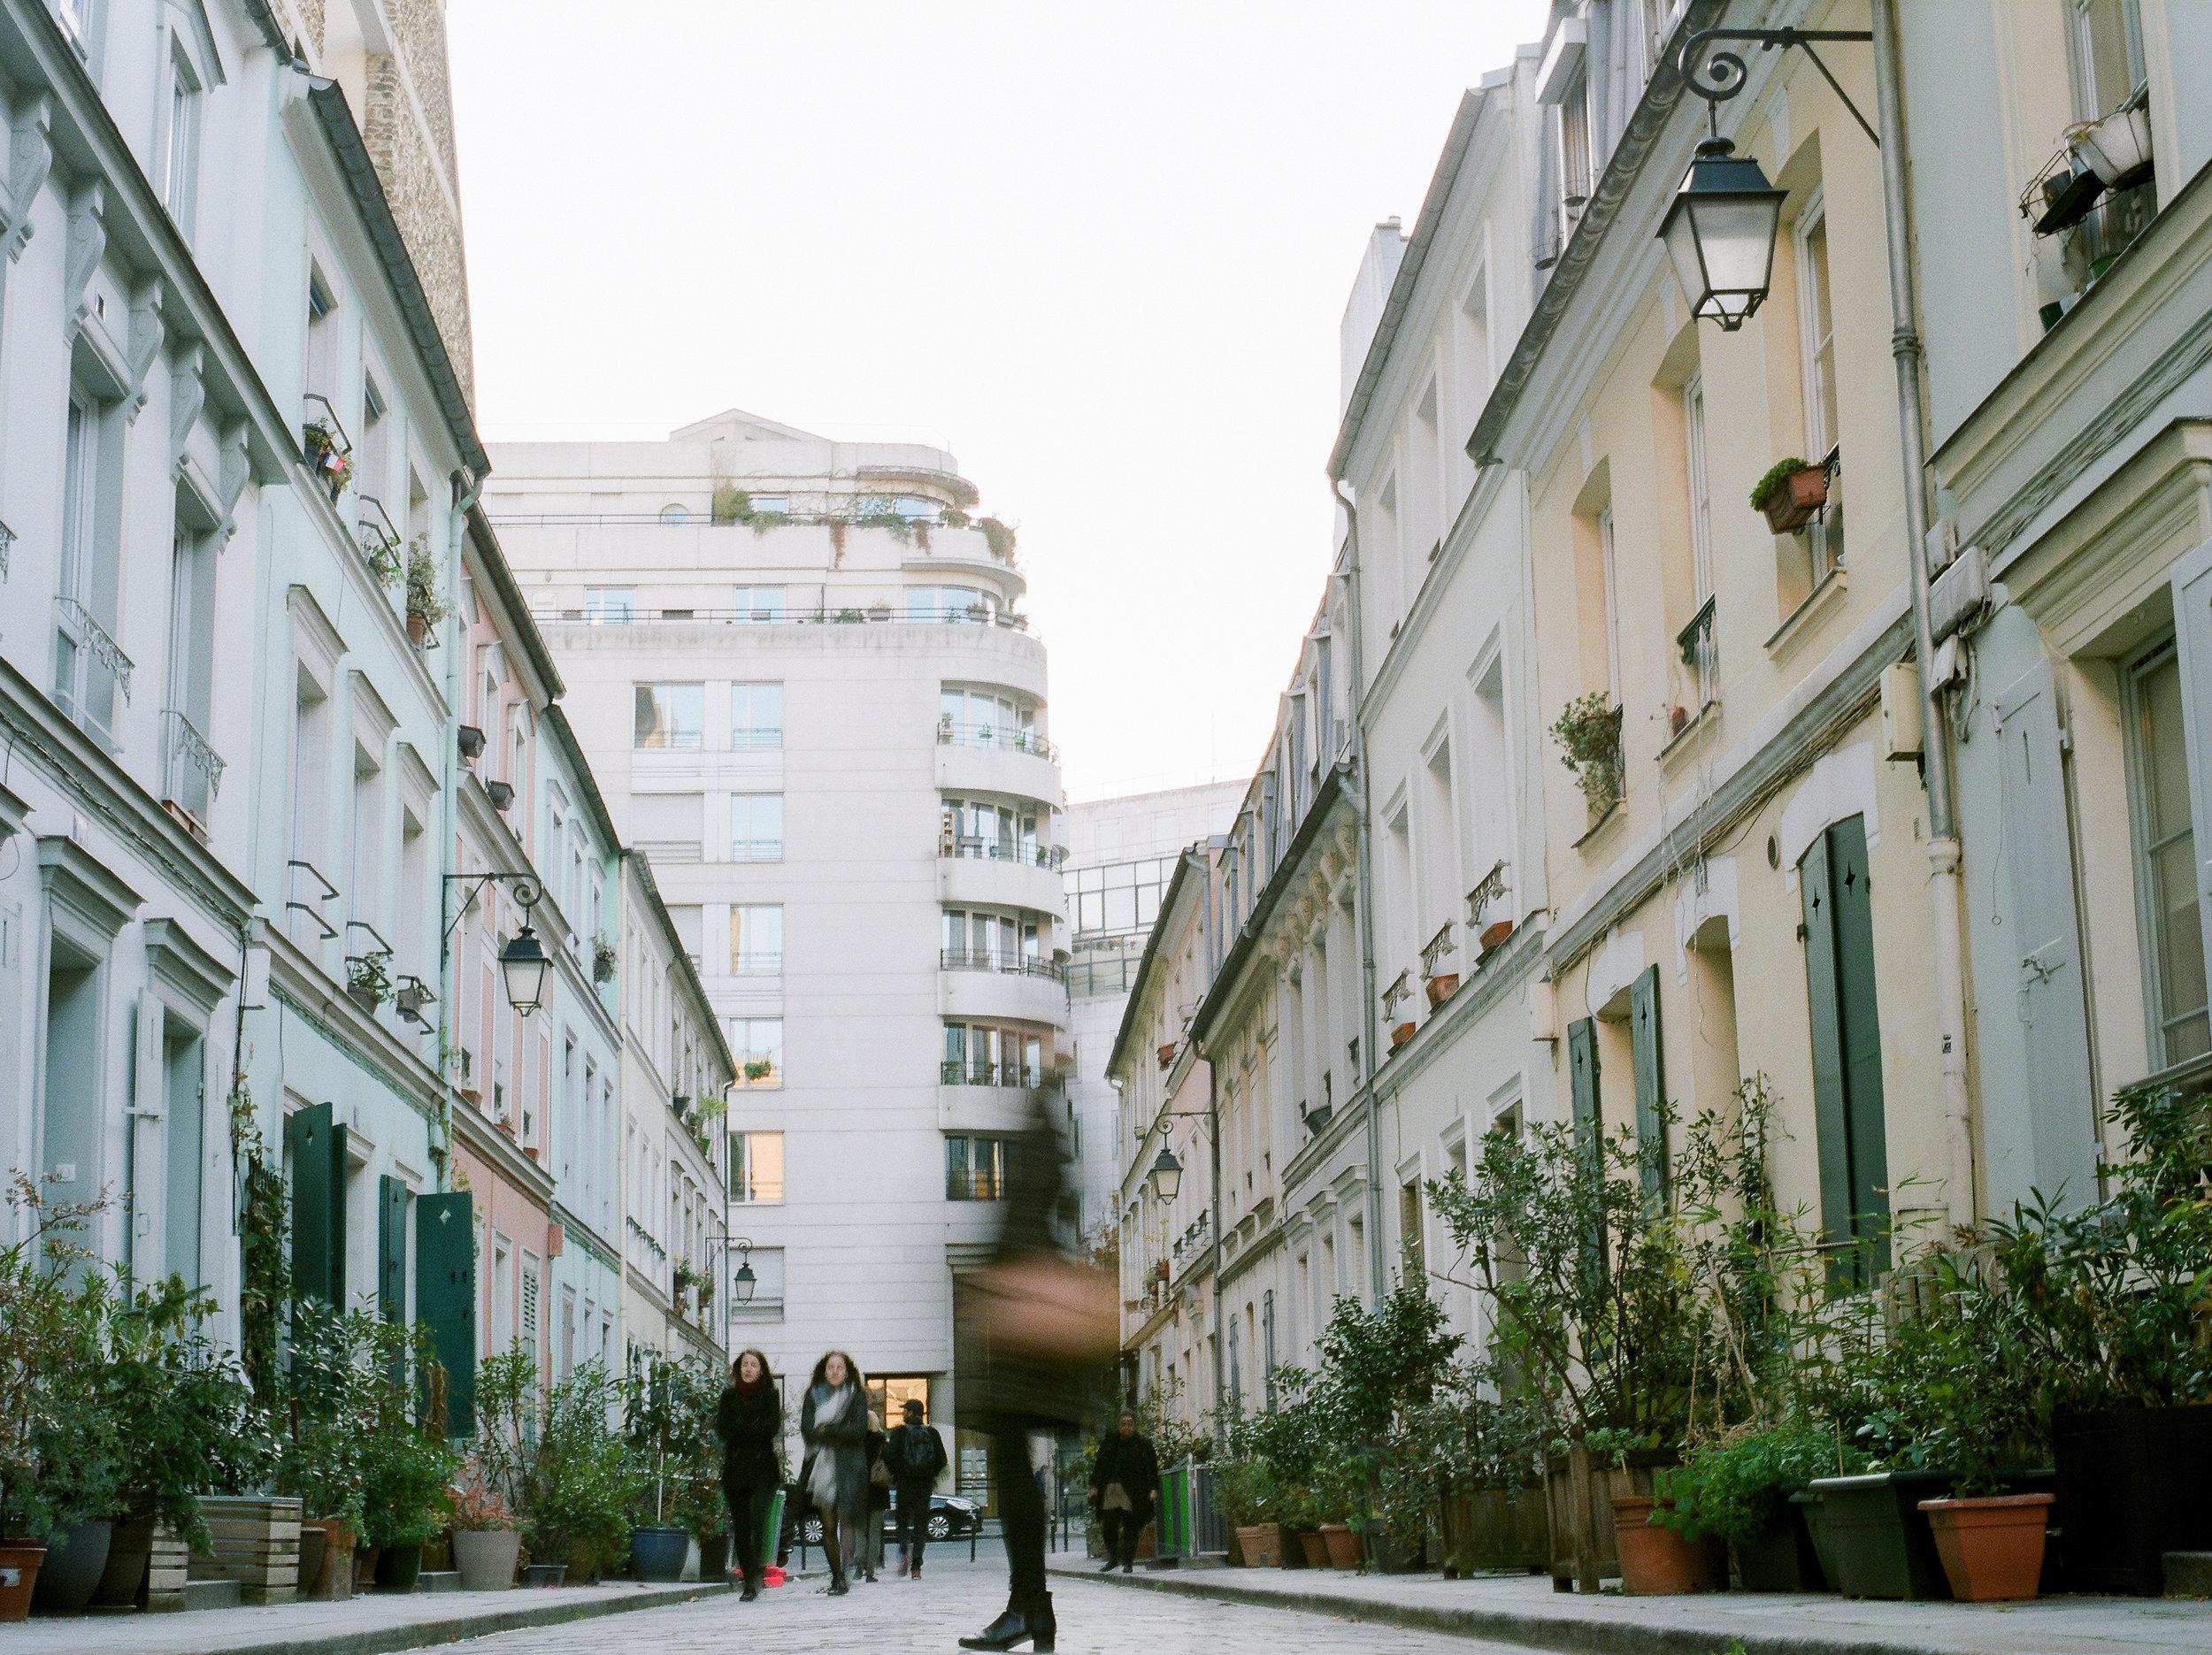 paris-lifestyle-travel-photographer-63.jpg